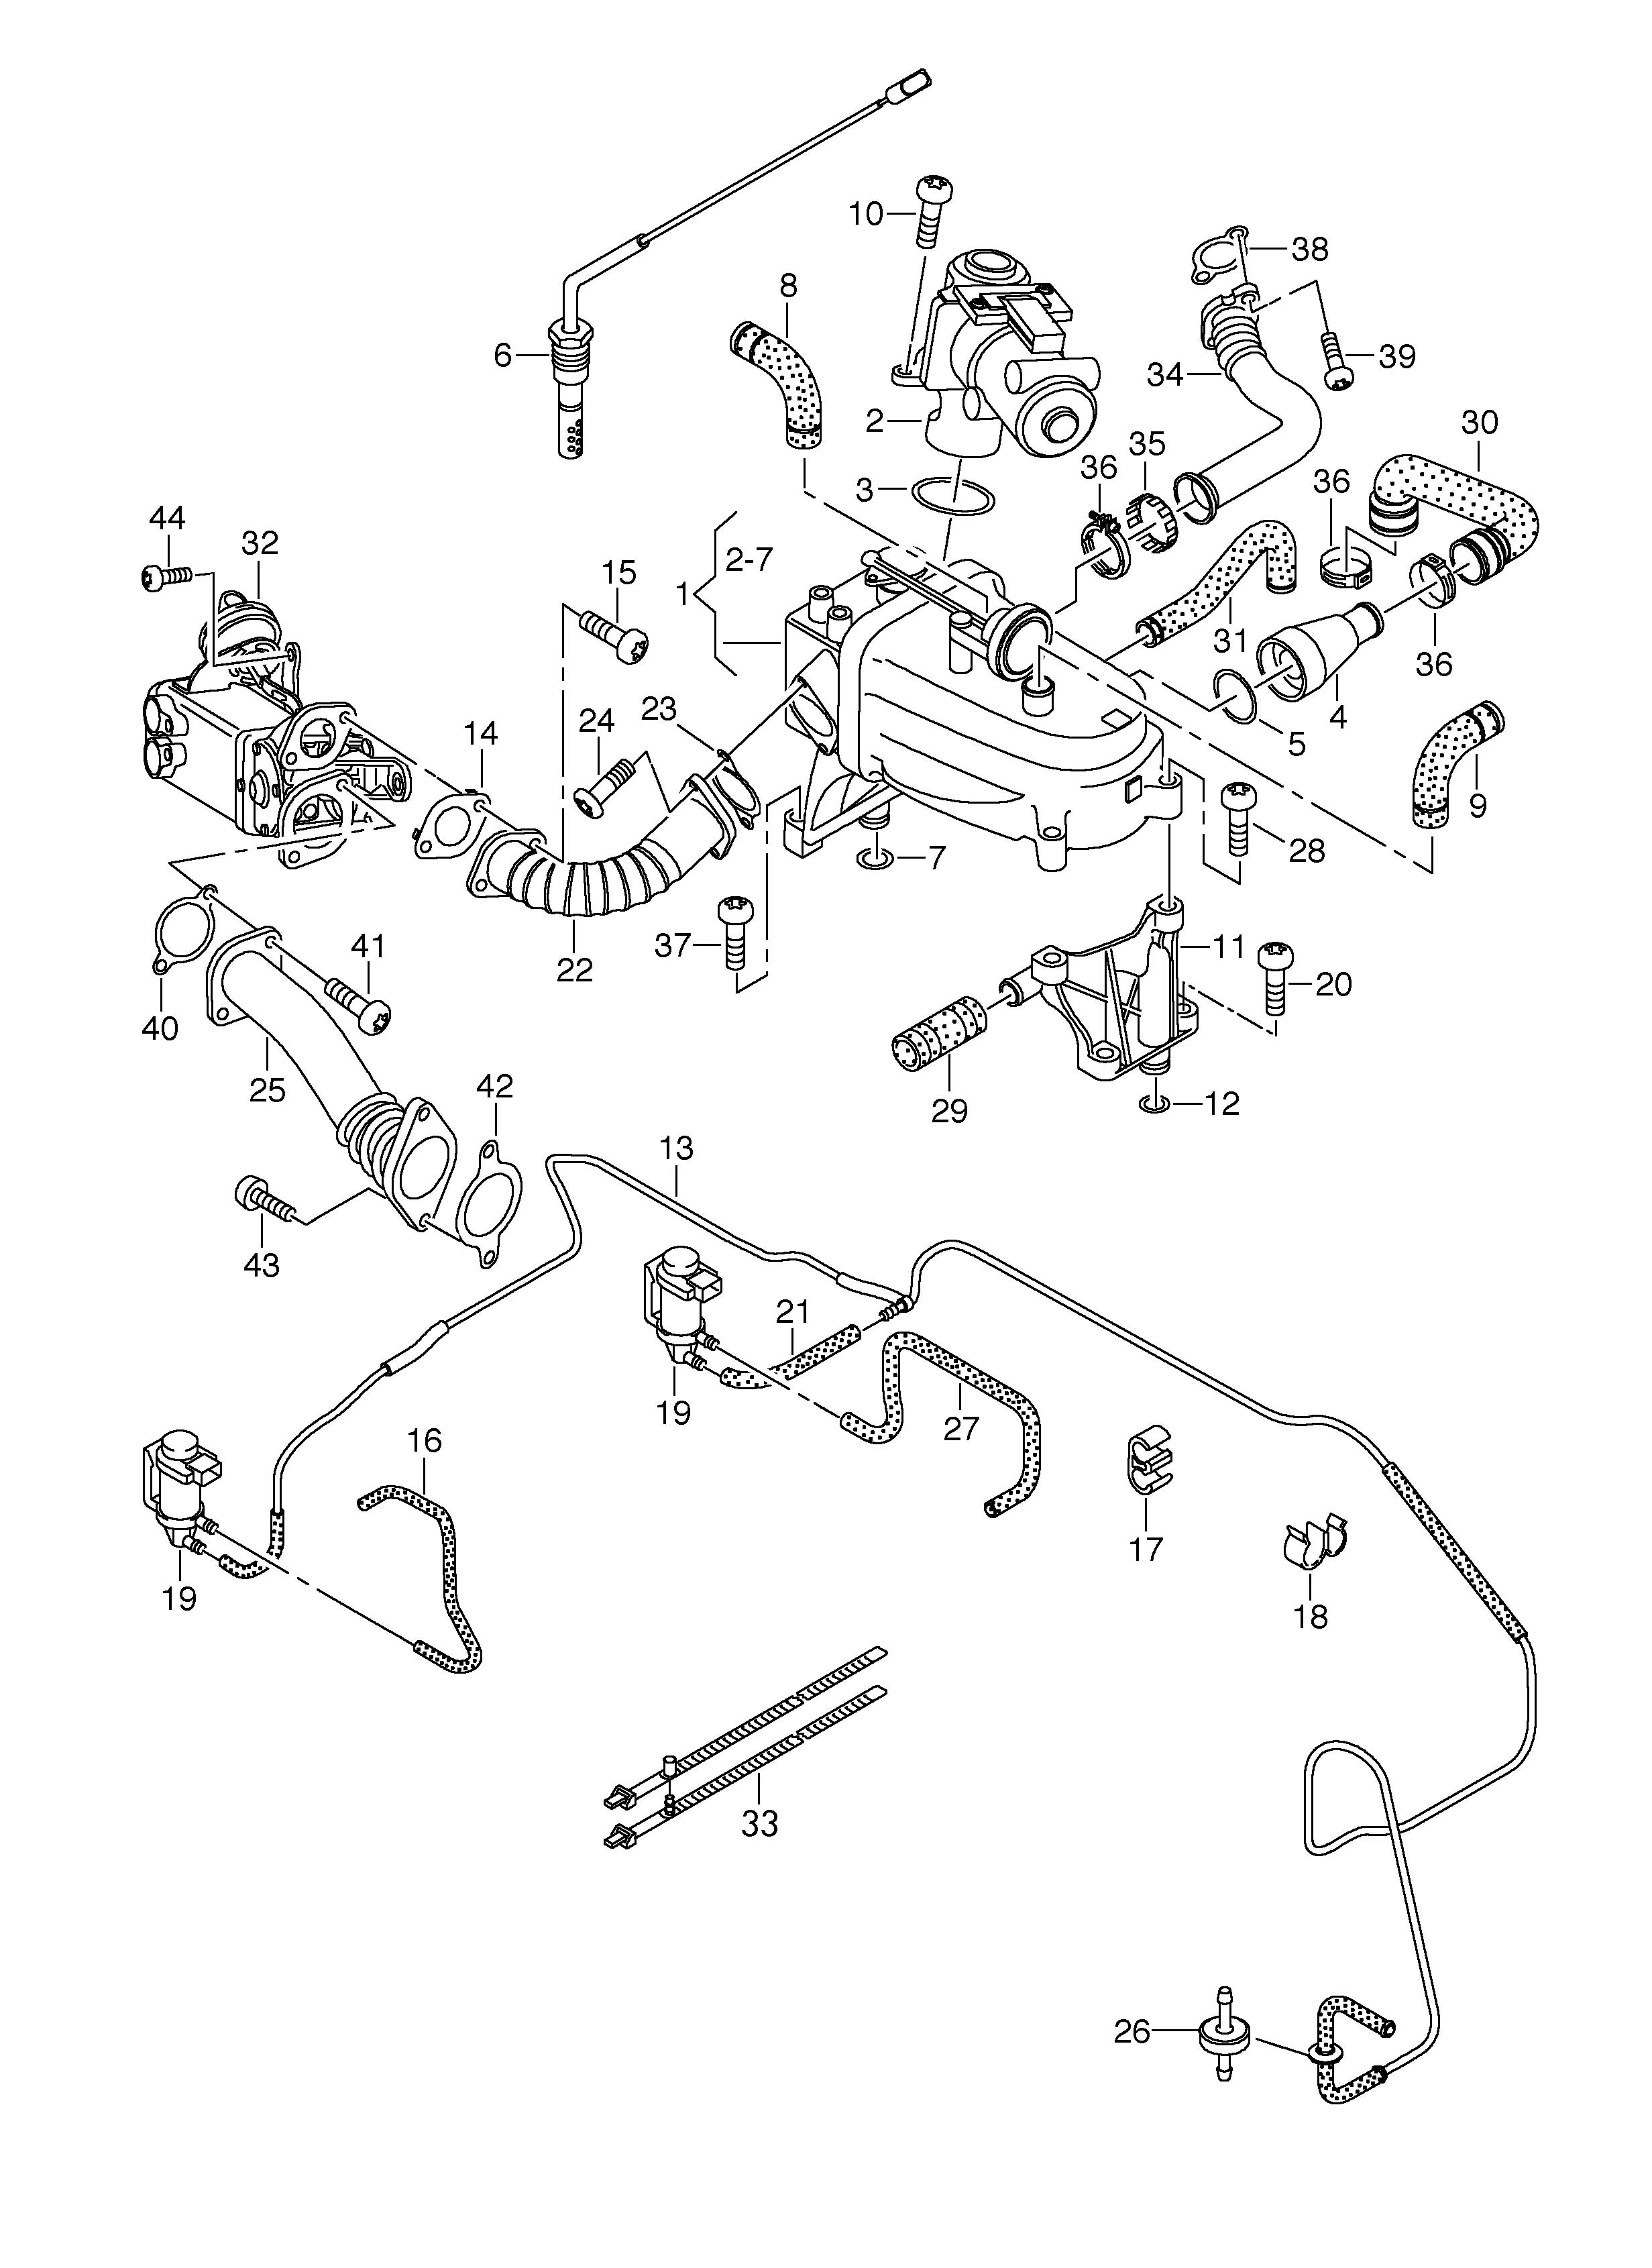 Volkswagen Touareg Vacuum System Exhaust Recirculation 3 0l